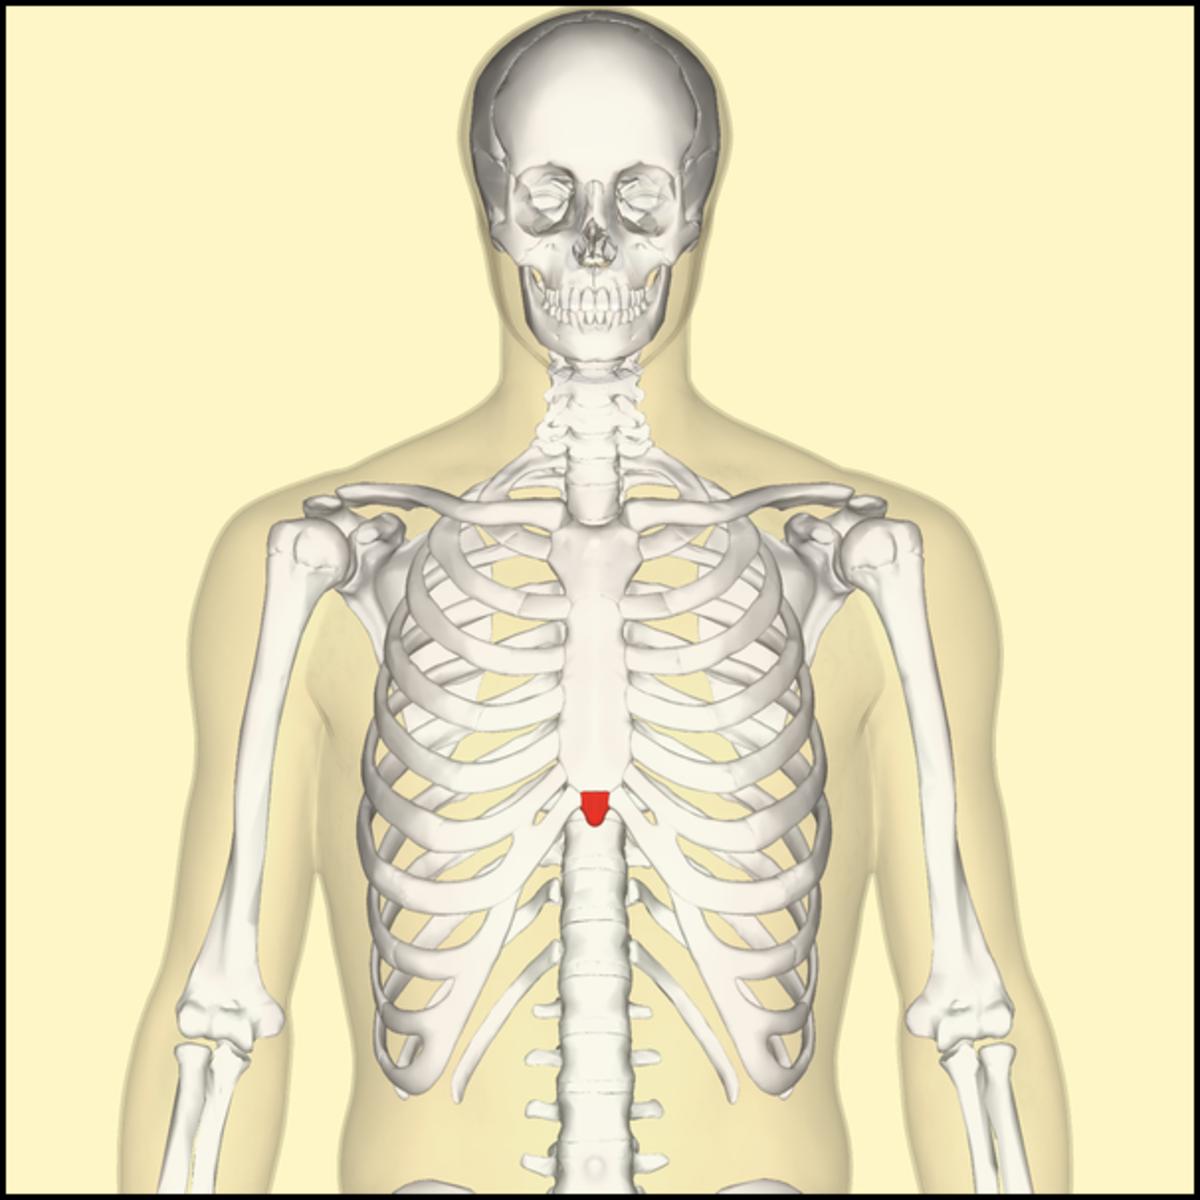 Xiphoid Process Pain: Causes, Symptoms, & Treatments